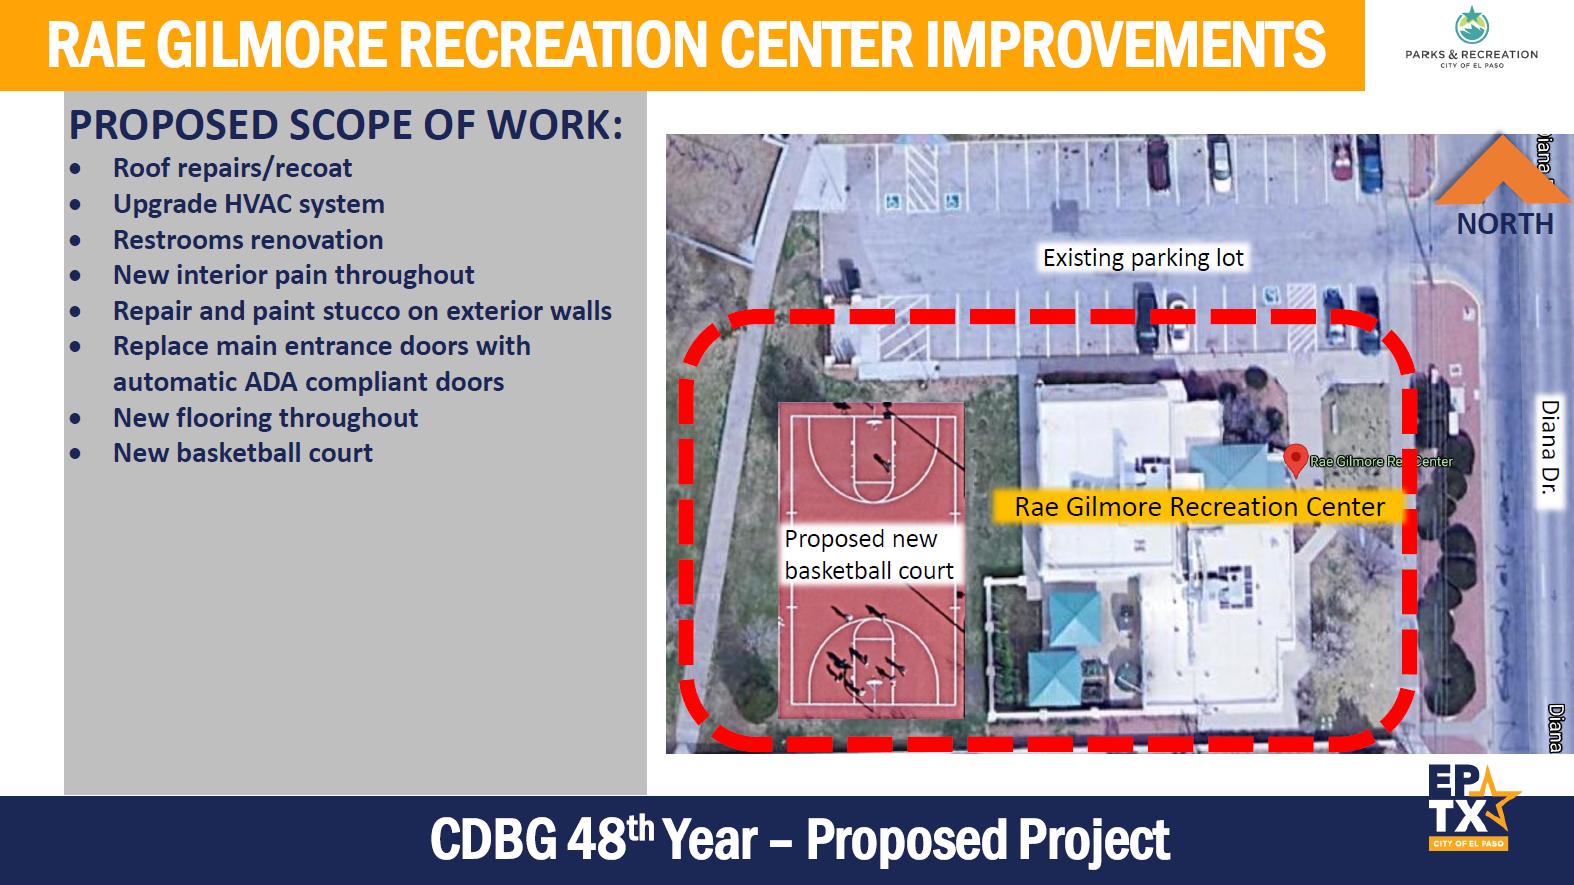 Rae Gilmore Recreation Center Improvements